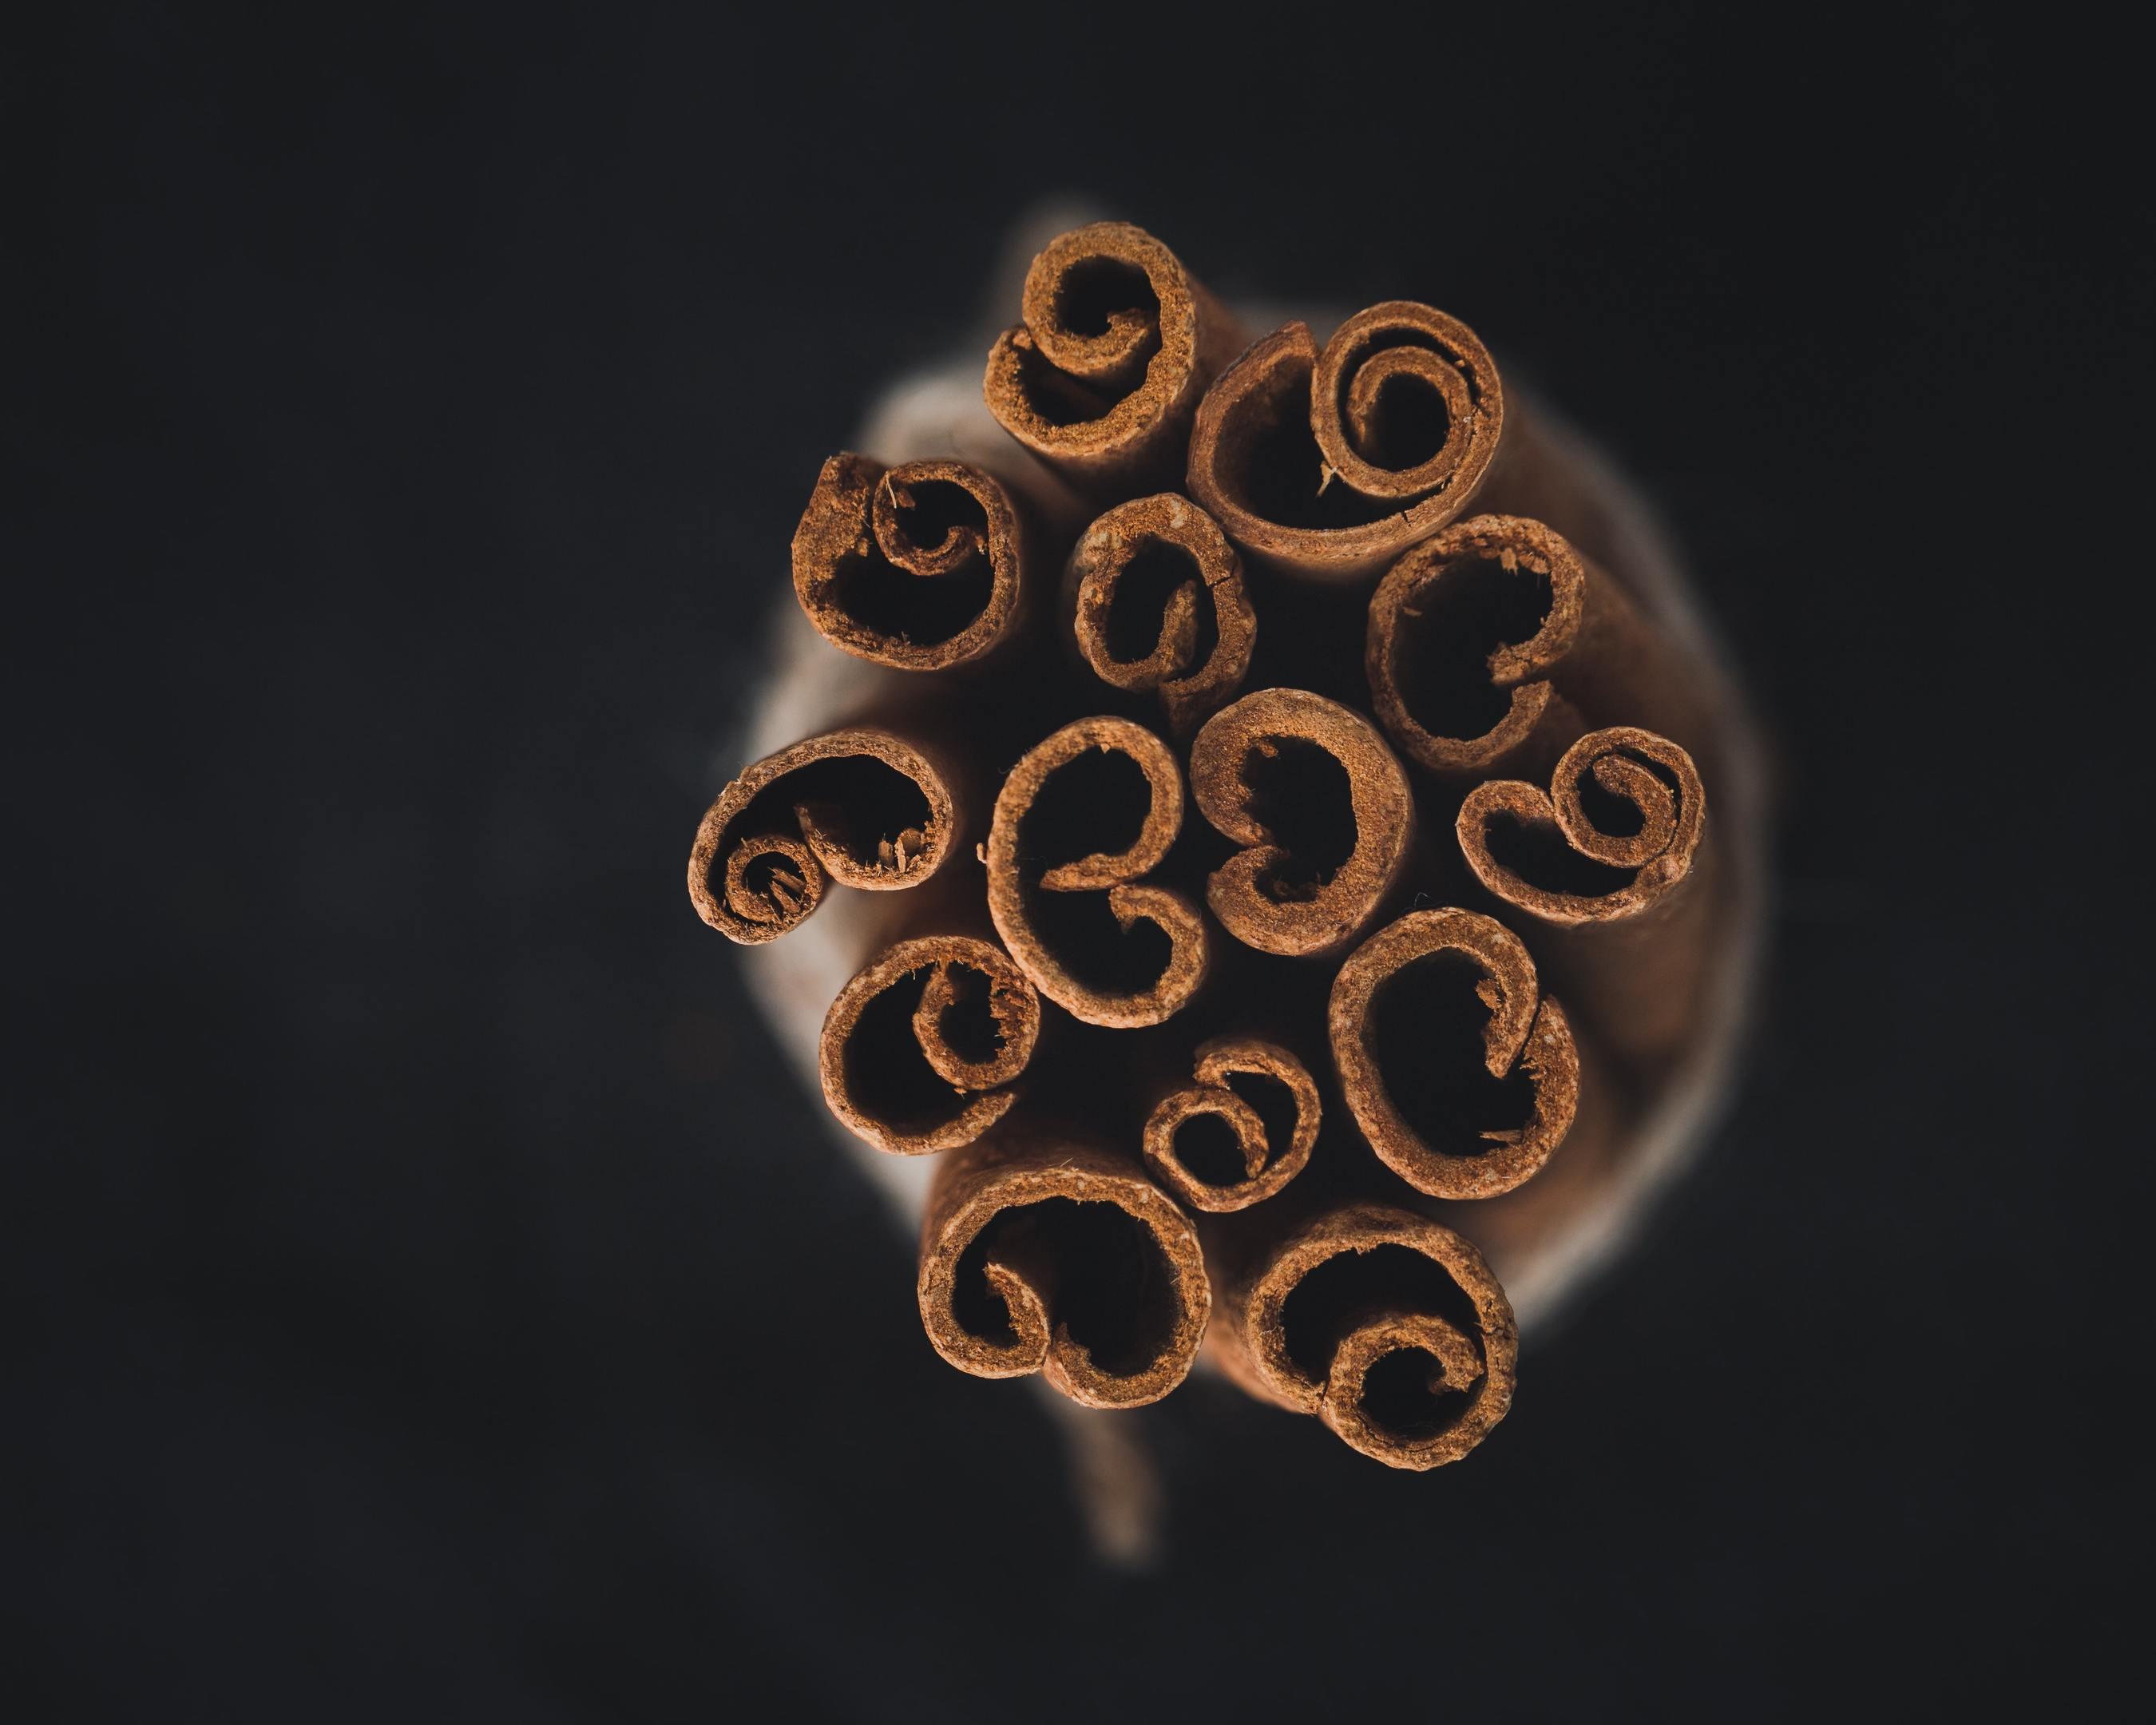 A bundle of fragrant cinnamon sticks on a black background